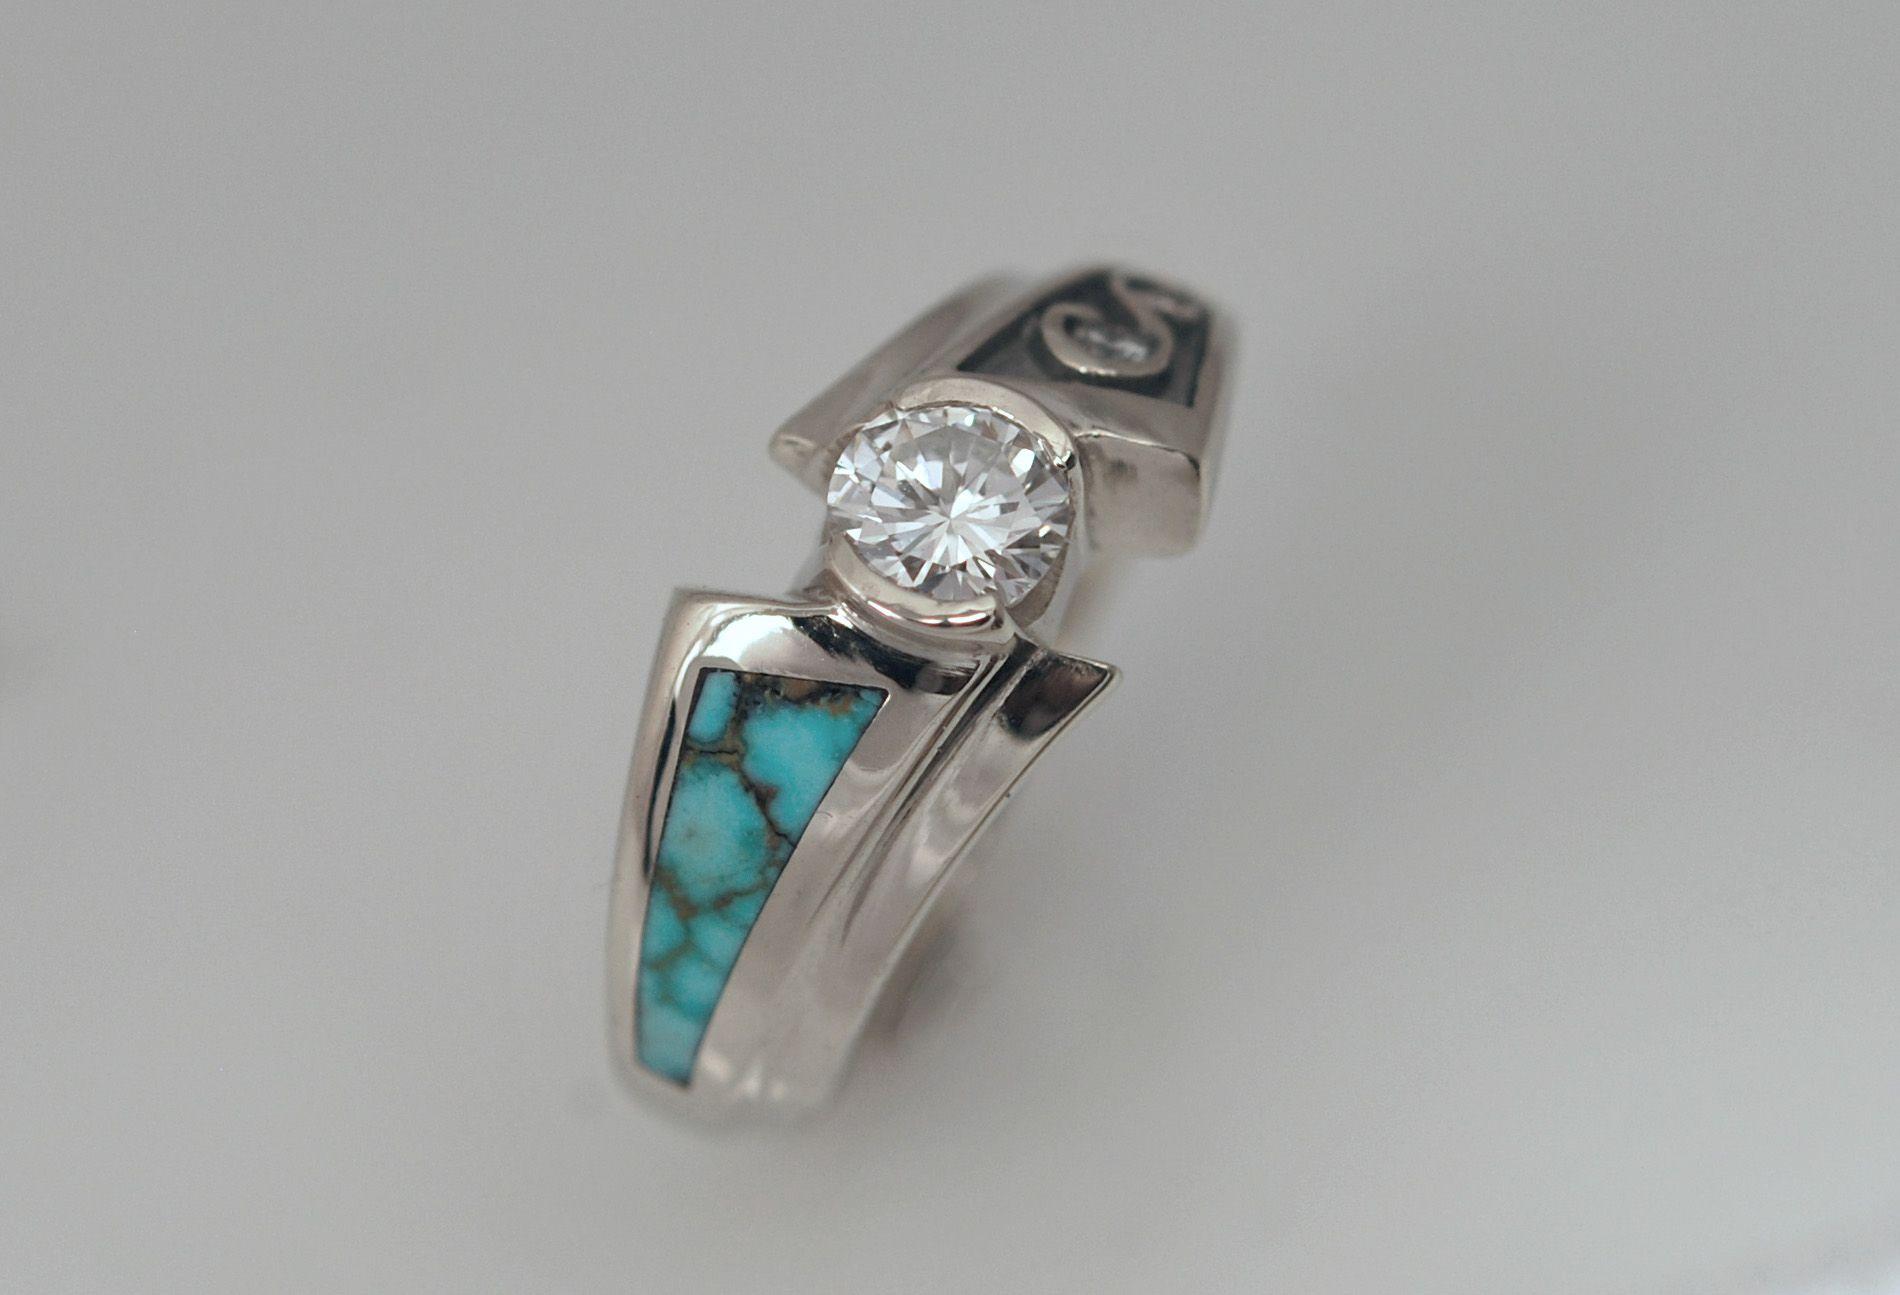 Contemporary Wedding Rings for Women Slide Show for